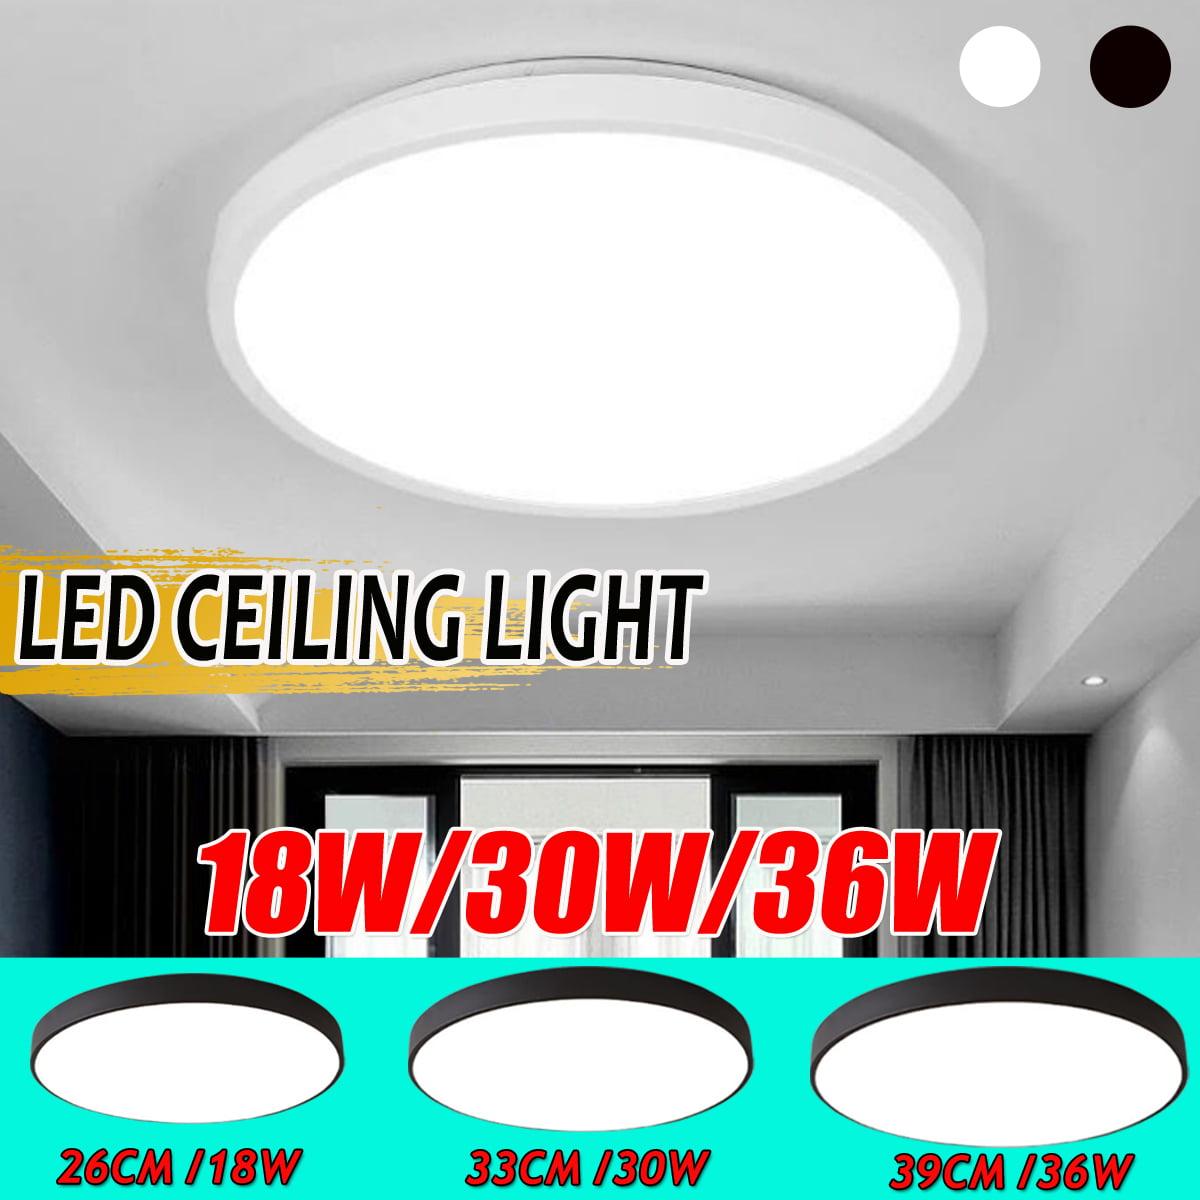 Image of: Ceiling Lights Led Flush Mount 6000k 6500k 18w 30w 36w Ceiling Lighting Fixtures Daylight White For Living Room Bedroom Kitchen Hallway Office Walmart Canada